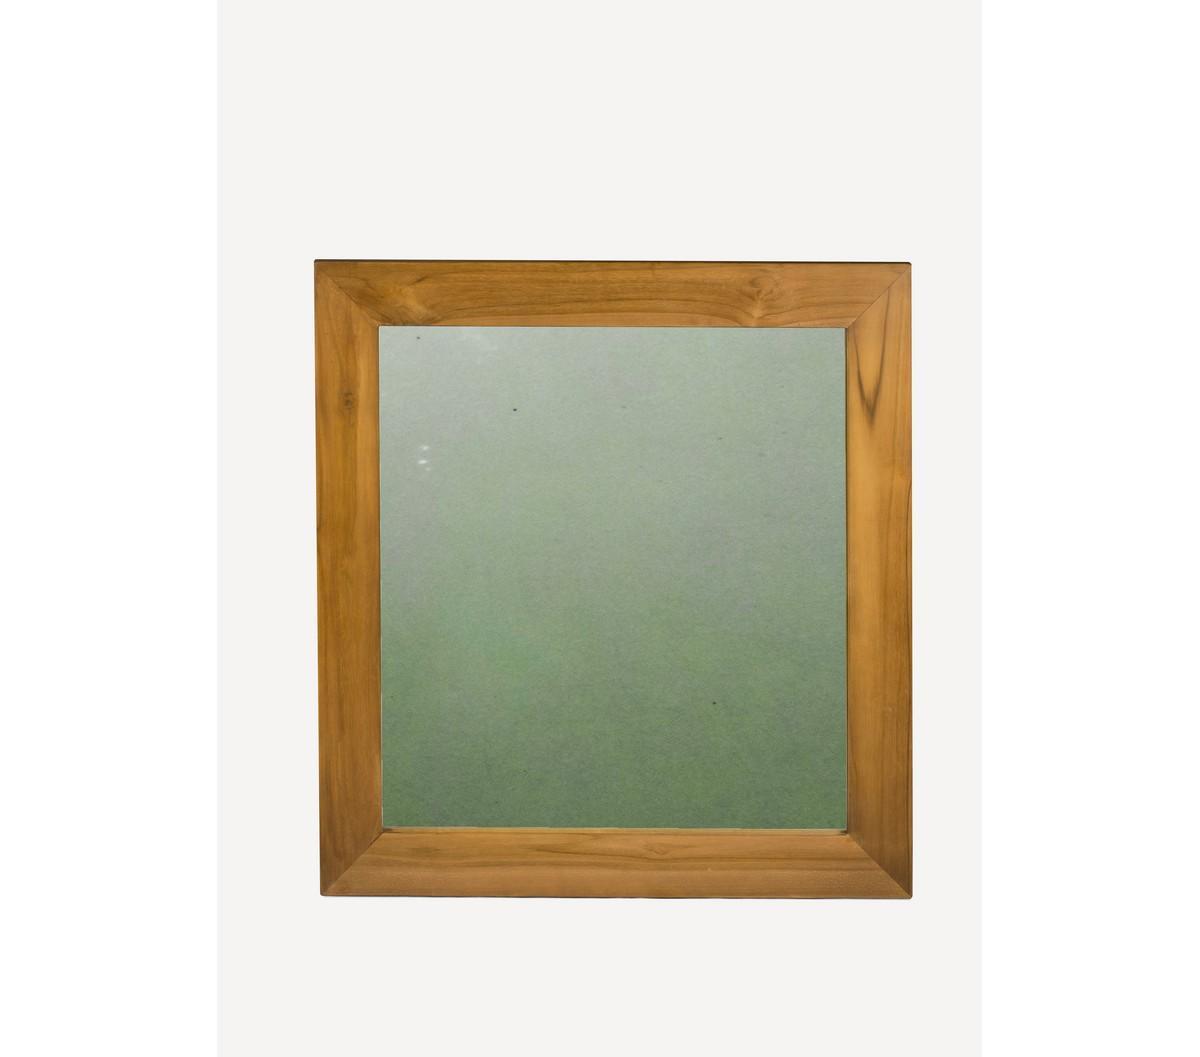 wood-en-stock Miroir en teck massif 75 cm x 80 cm